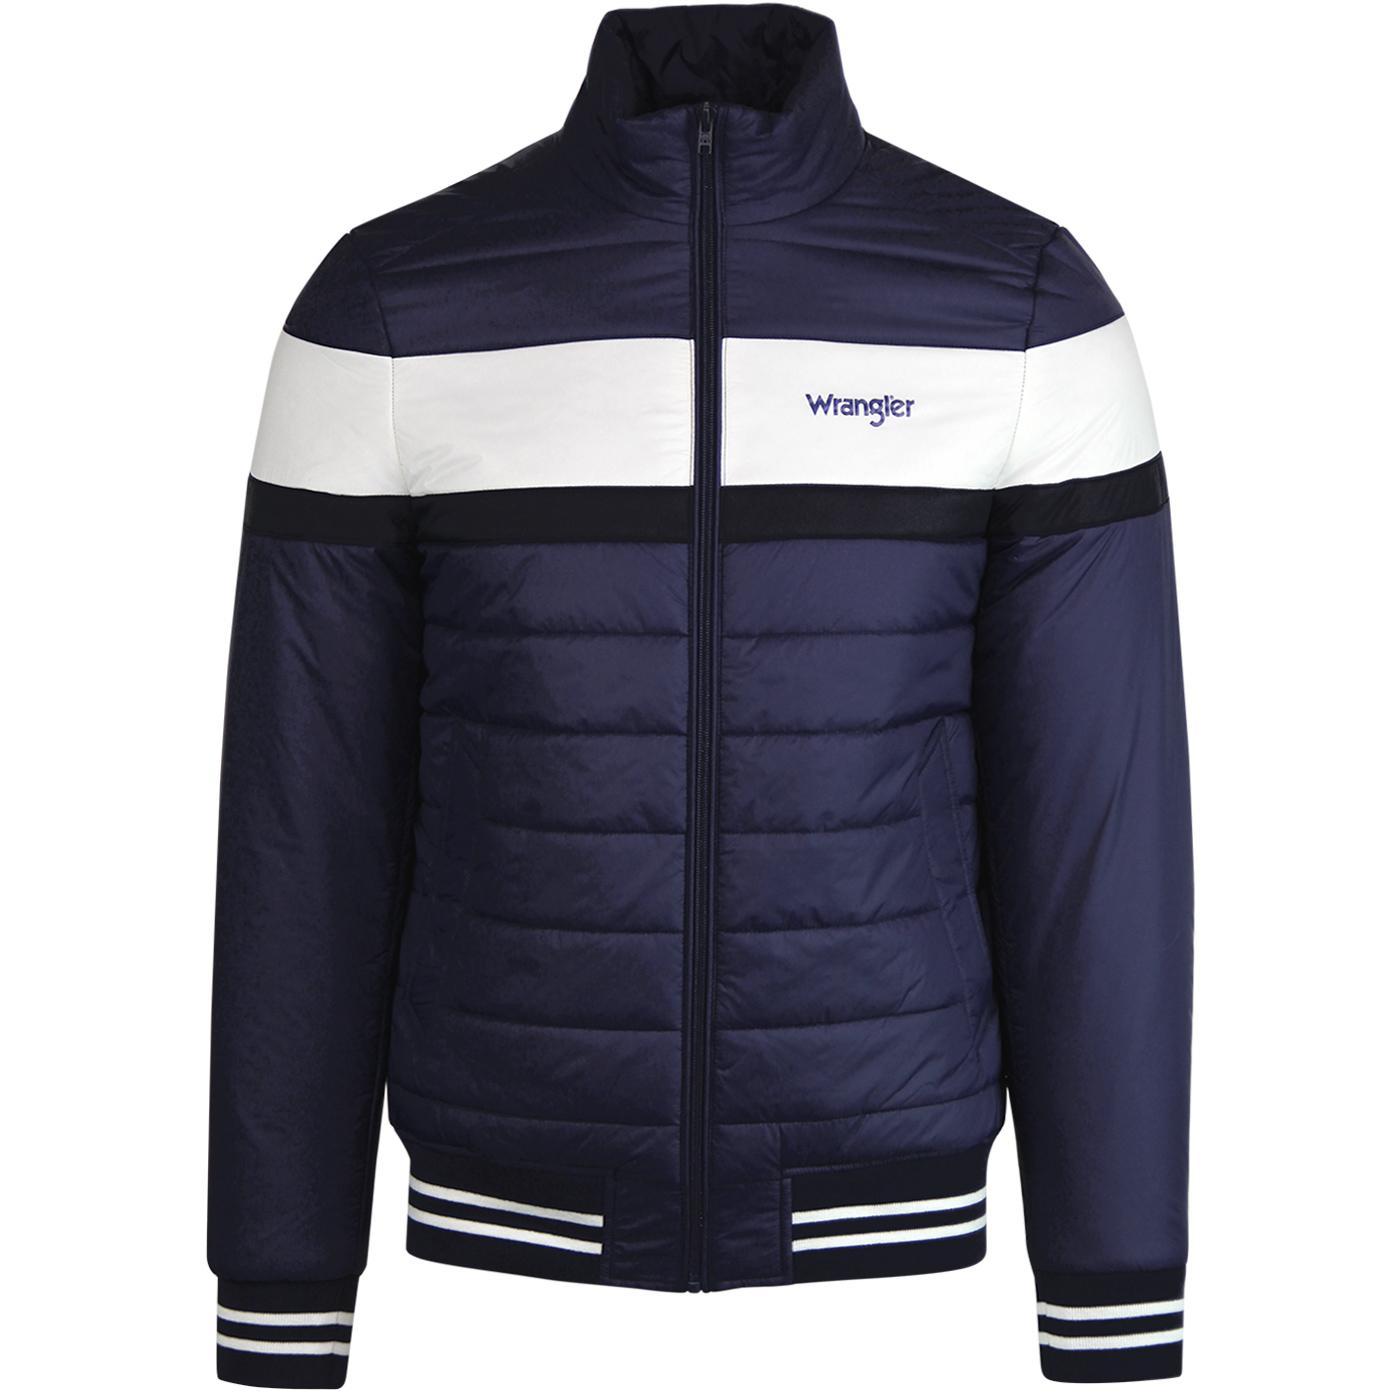 WRANGLER Retro 80s Colour Block Puffer Jacket (BD)